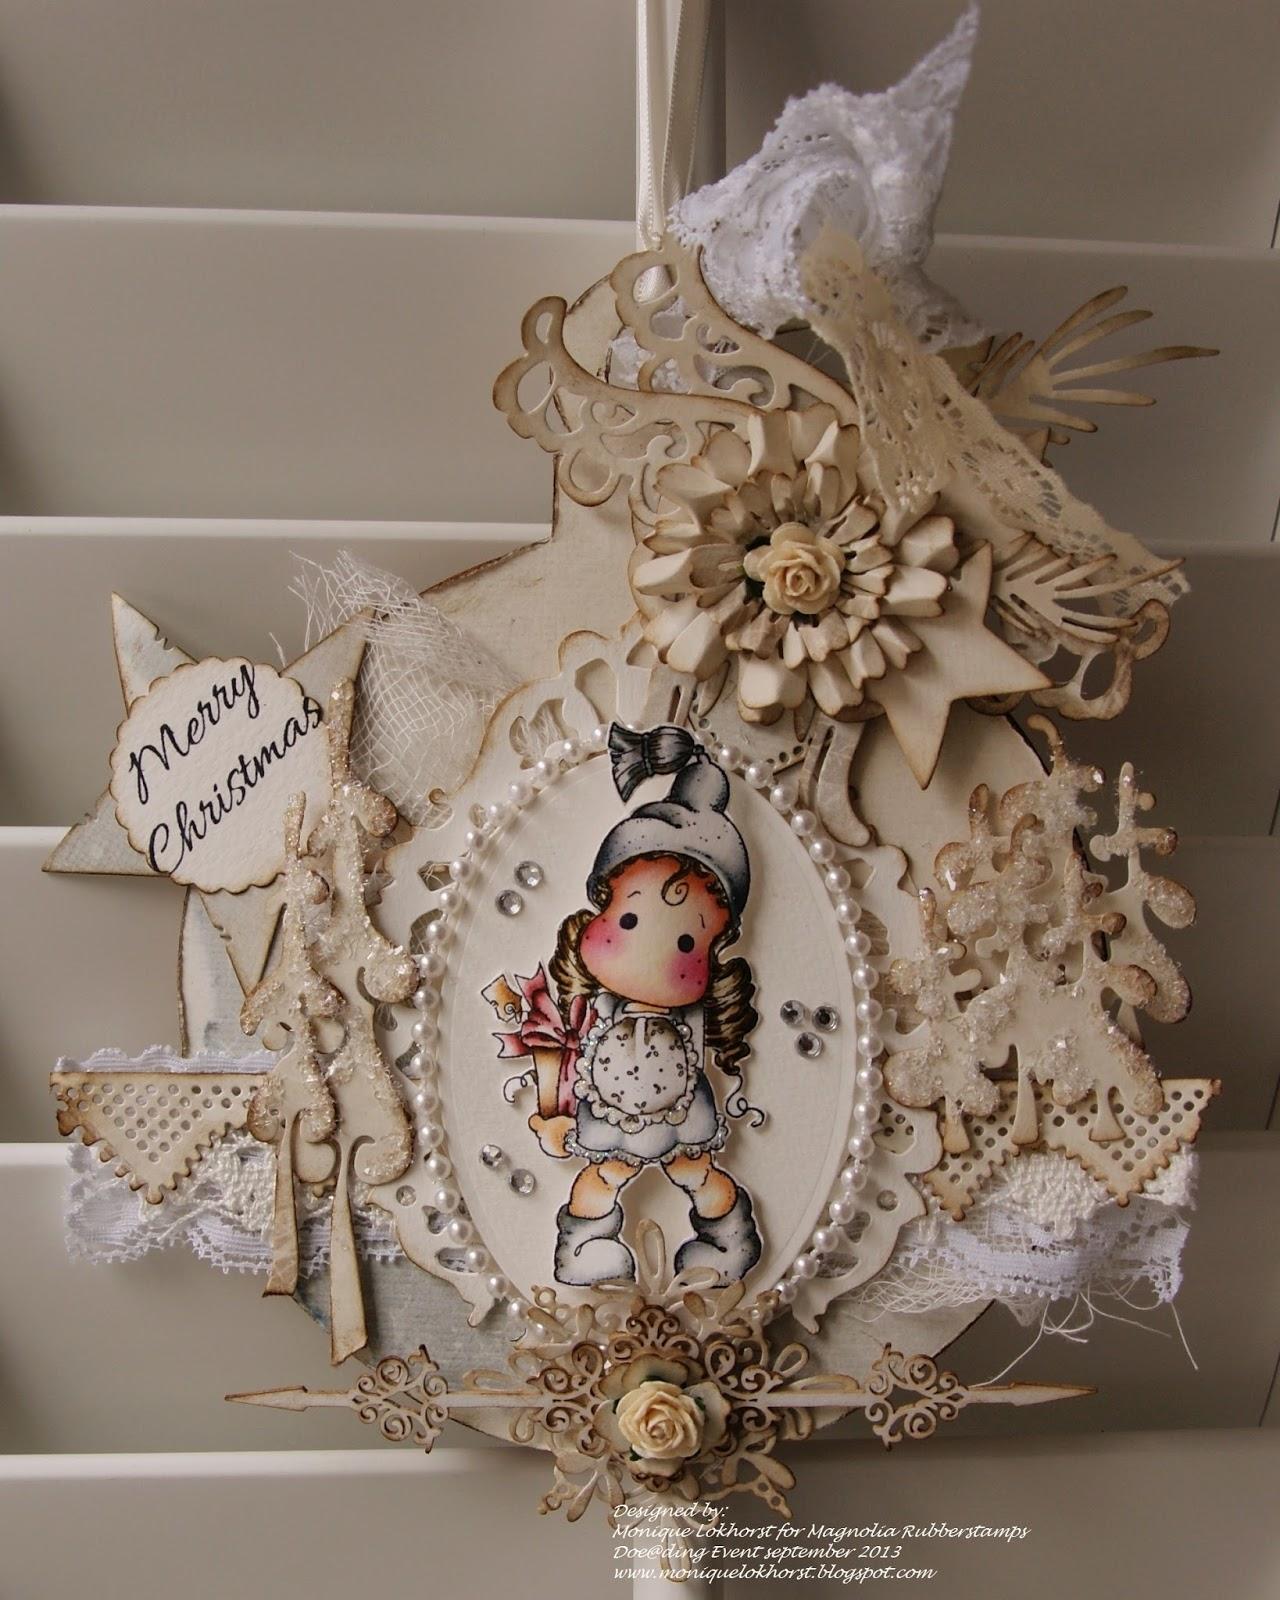 Best Christmas Decoration Malaysia 2013: Monique Lokhorst Designs: Merry Christmas Decoration! Doe